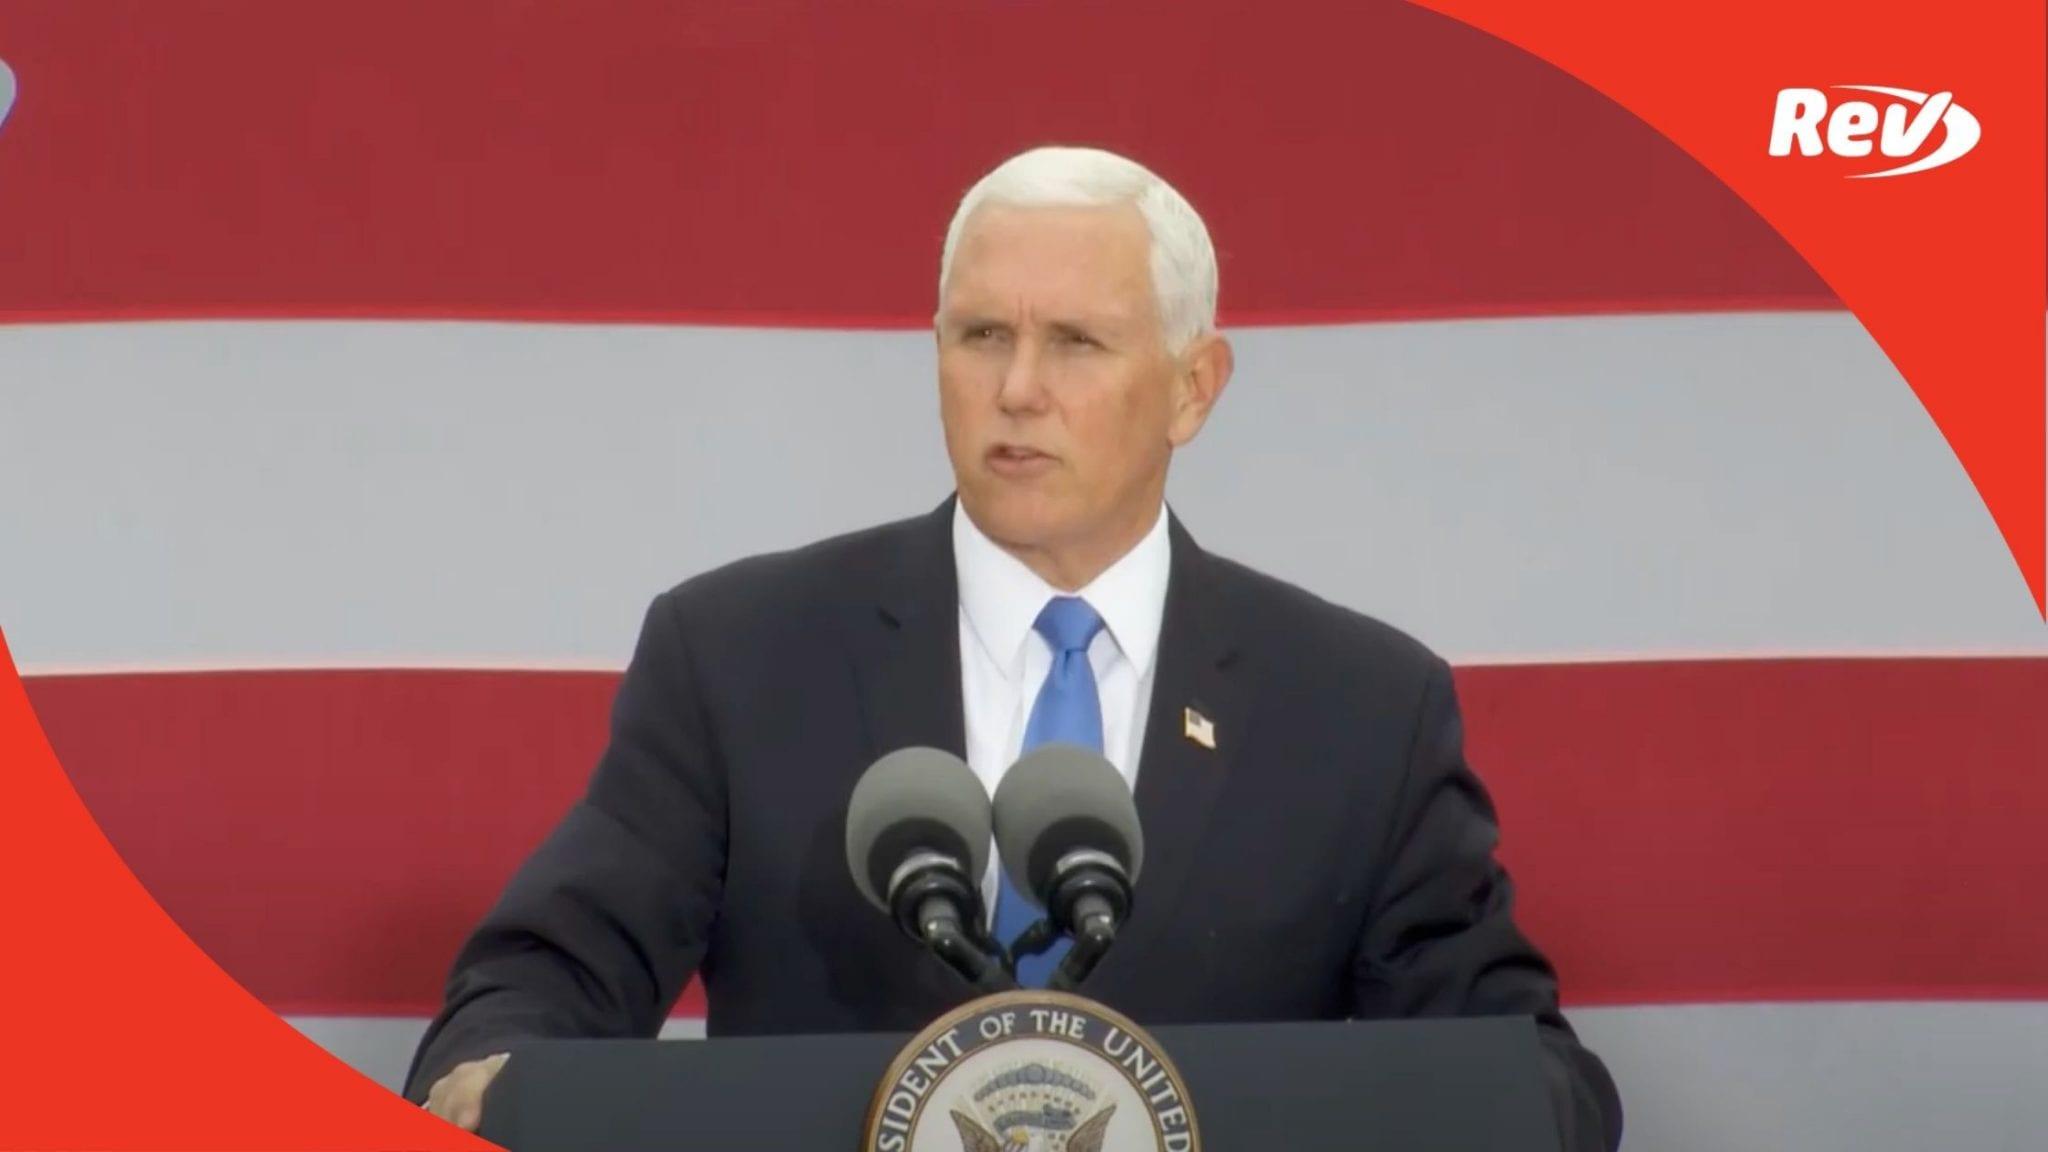 Mike Pence Campaign Speech Grand Rapids, Michigan Transcript October 14